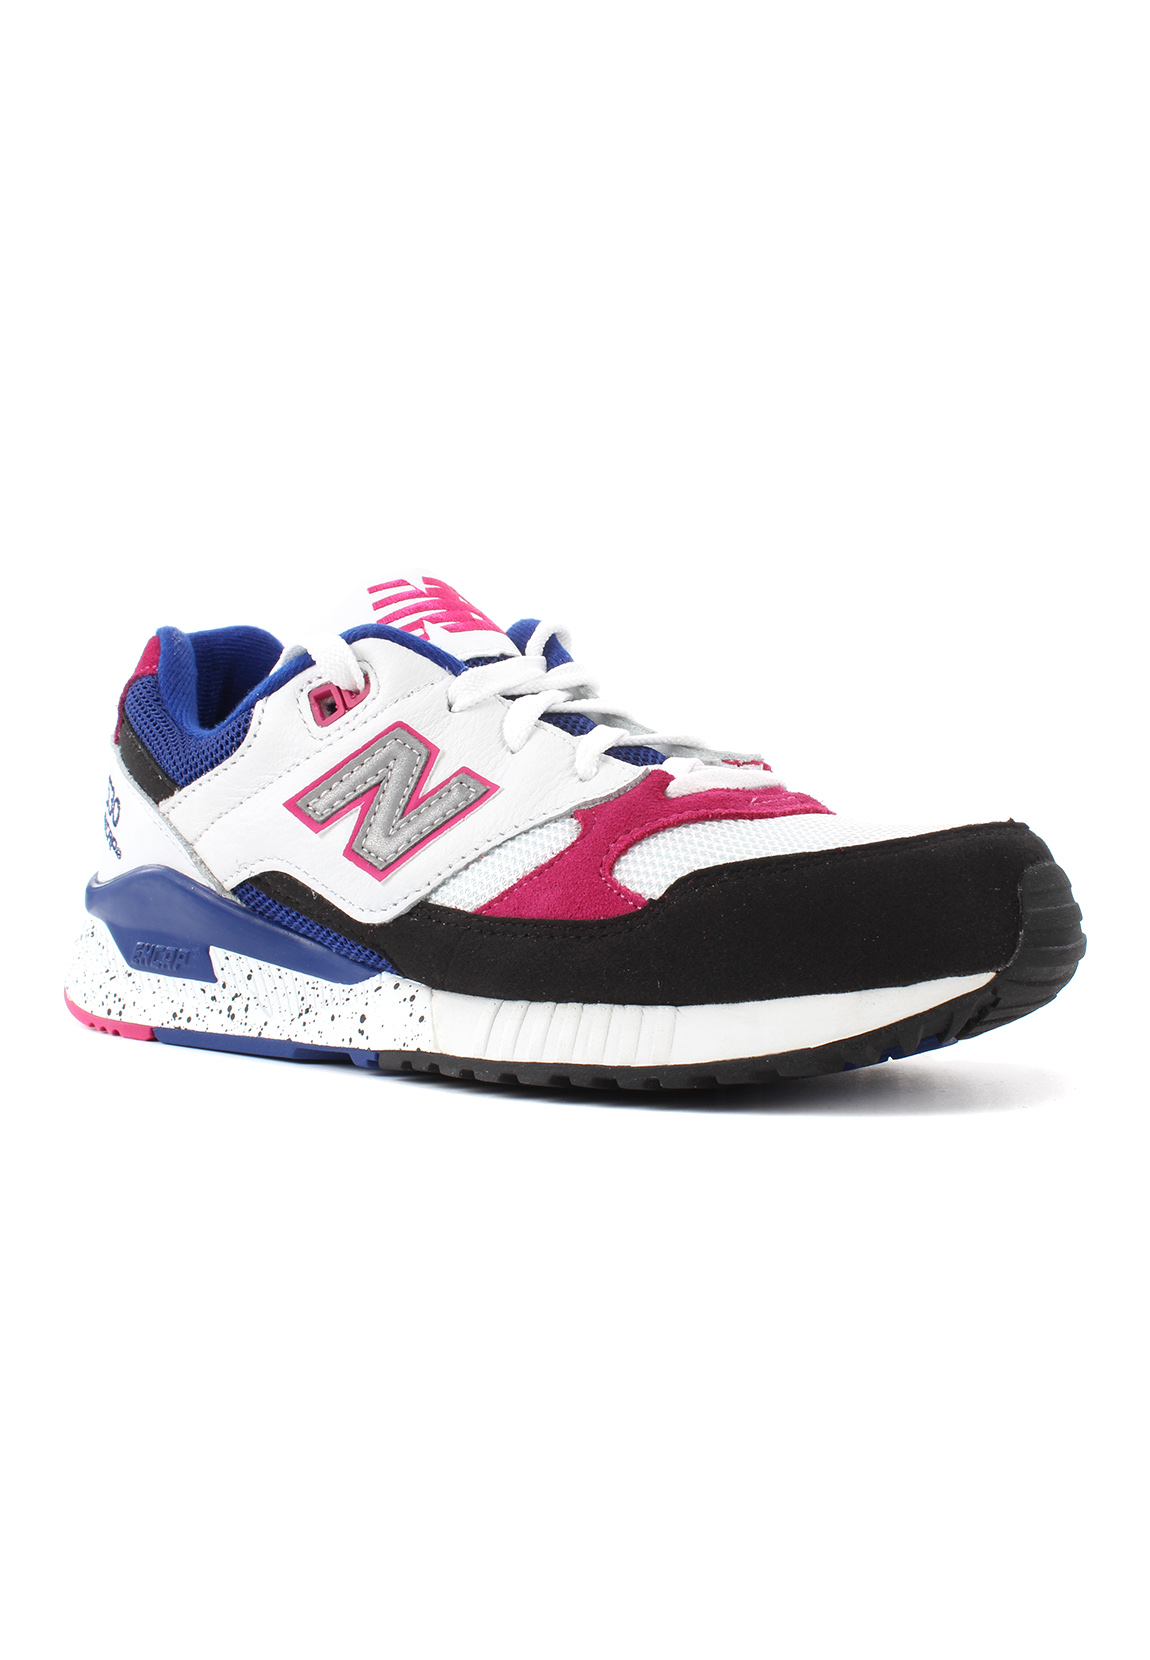 Details zu New Balance Damen Sneaker W530PSA Mehrfarbig Weiss Pink Blau